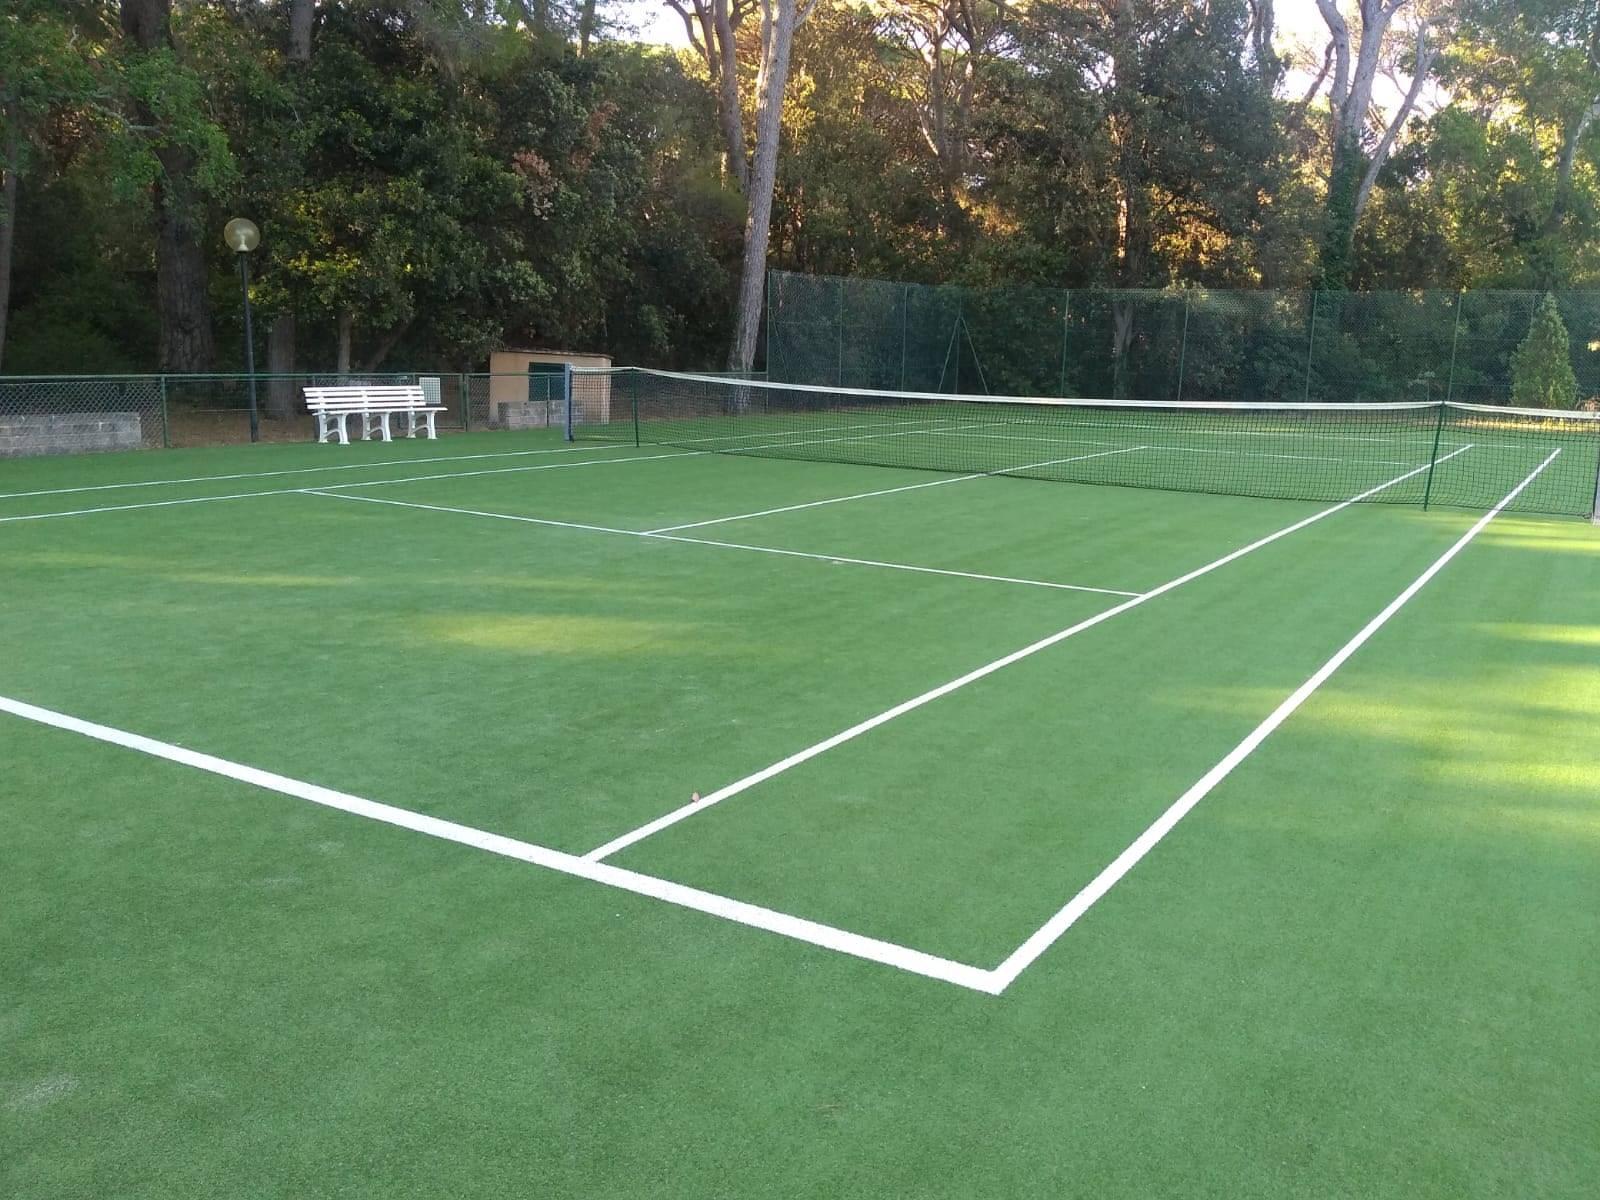 R11-campo tennis